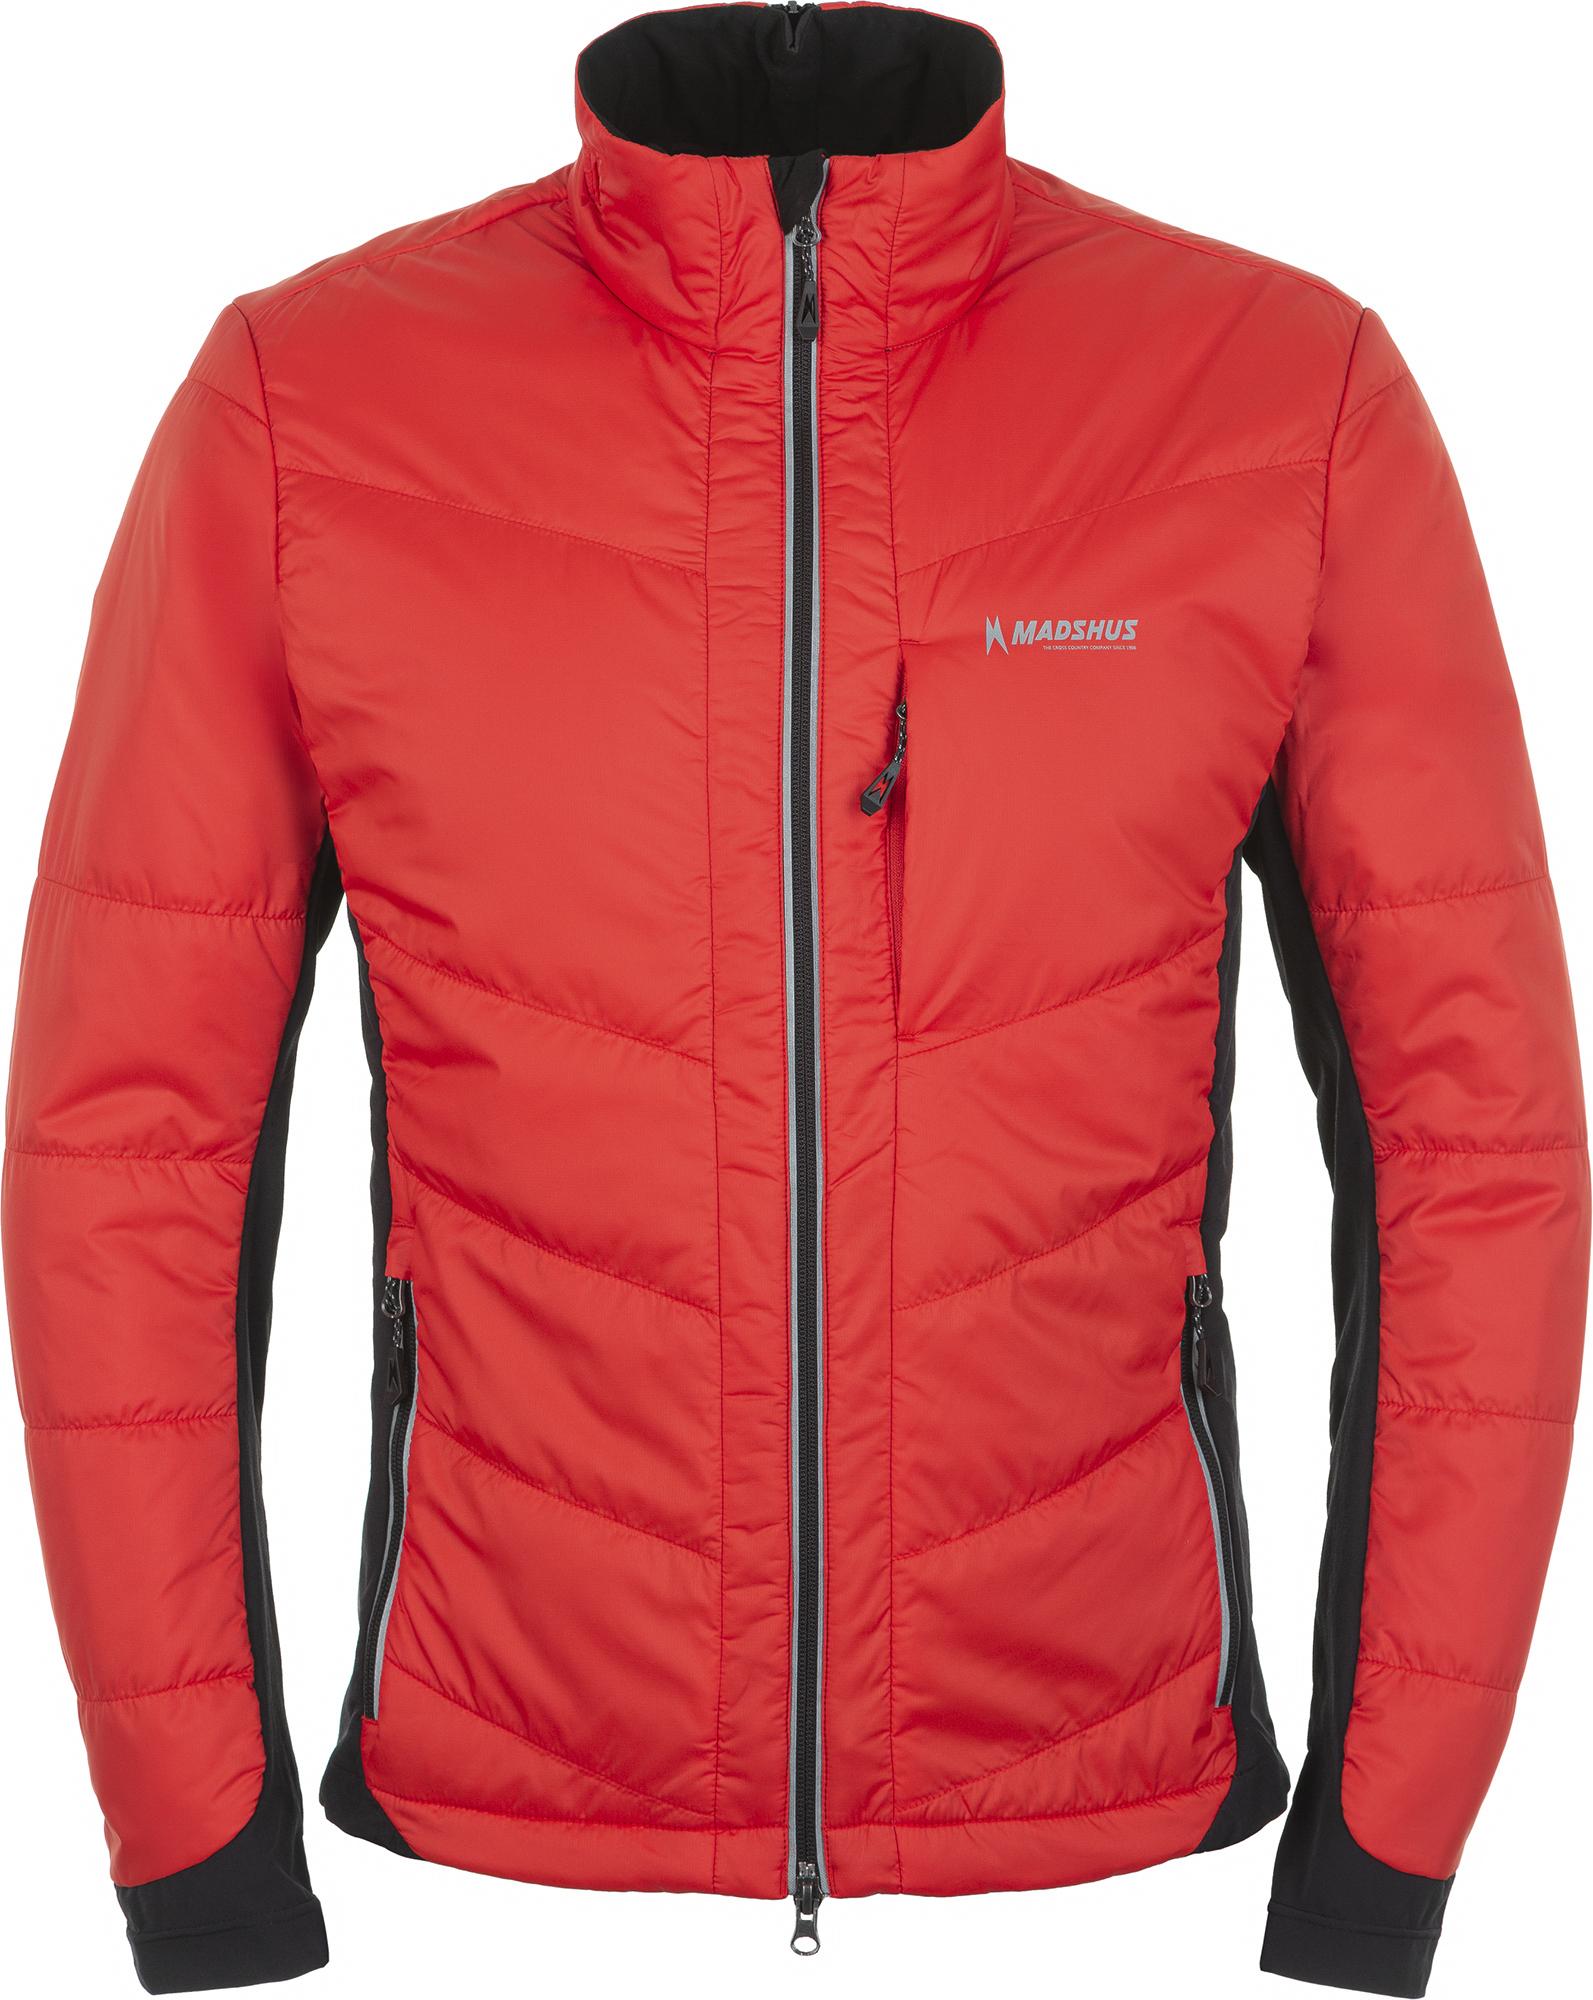 Madshus Куртка утепленная мужская Madshus, размер 52 madshus ботинки для беговых лыж madshus ct 90 размер 43